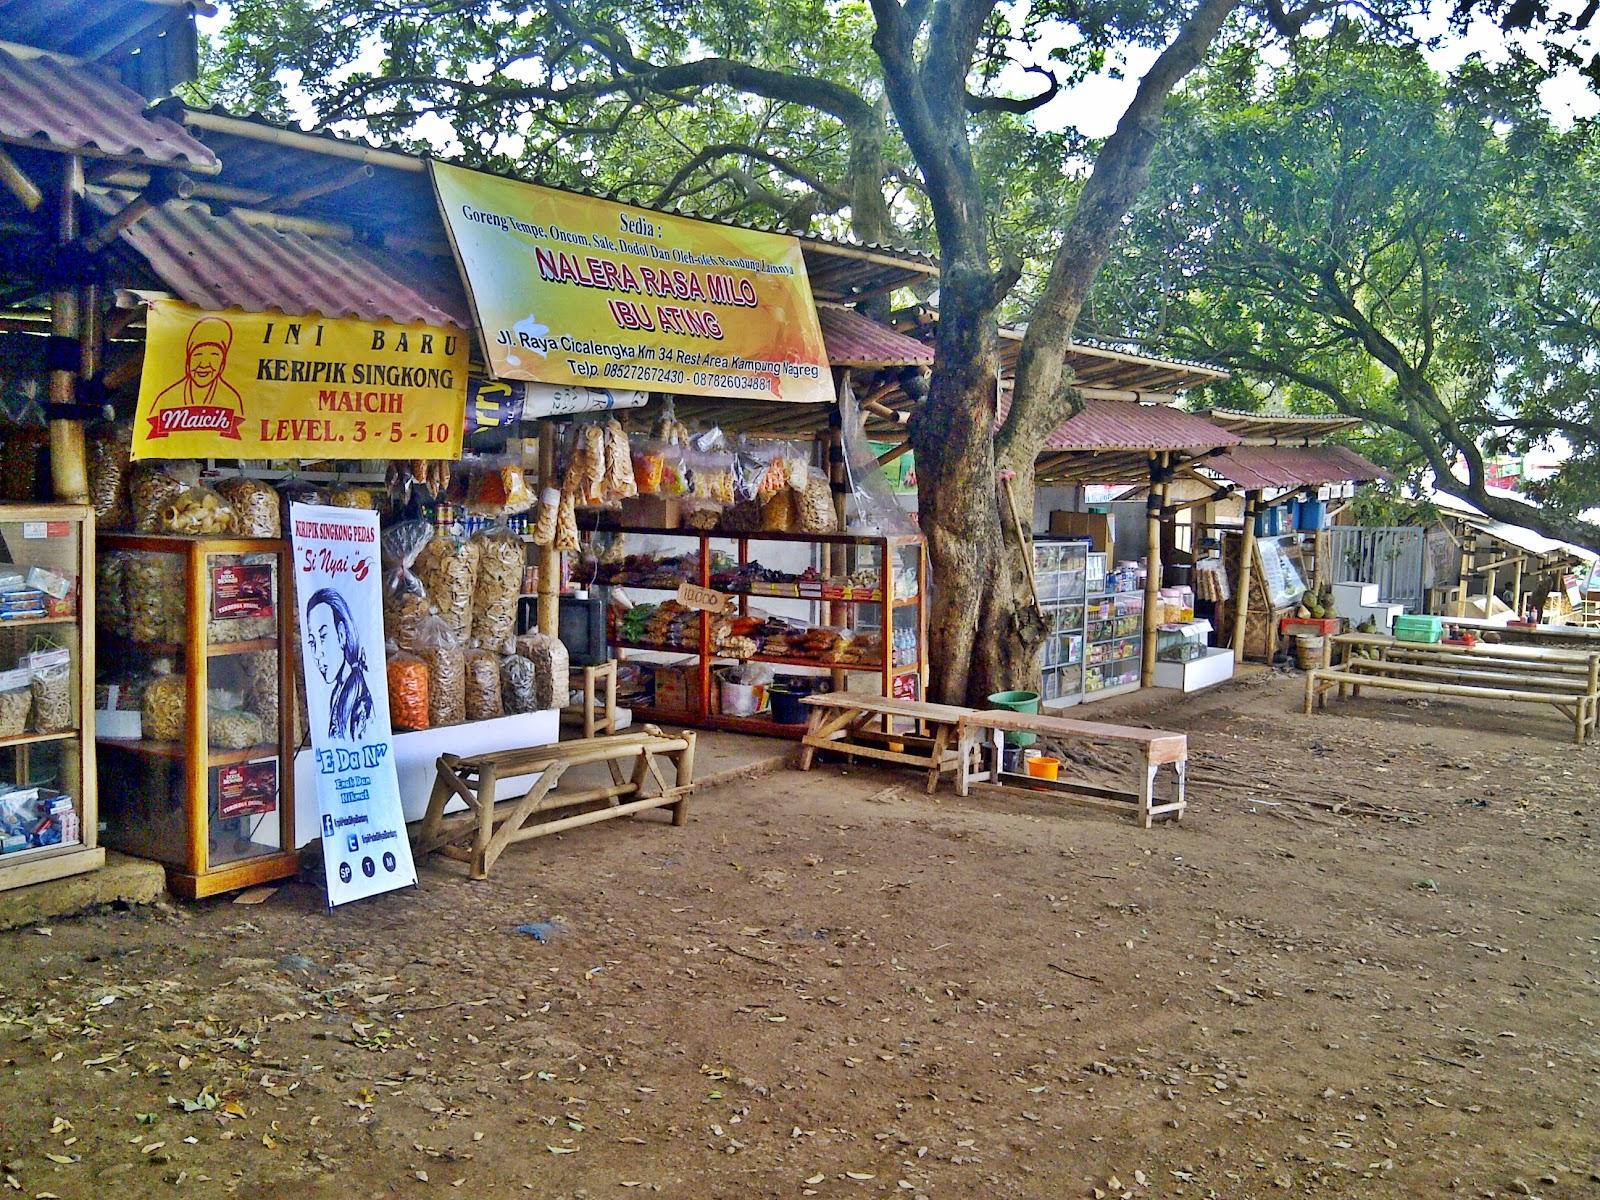 Boot Oleh Kampoeng Nagreg Keripik Singkong By Nyamen Pgp Sebagian Besar Jawa Barat Pun Kami Sediakan Bagi Anda Para Pengunjung Rest Area Dengan Lingkungan Yang Bersih Dan Nyaman Juga Didukung